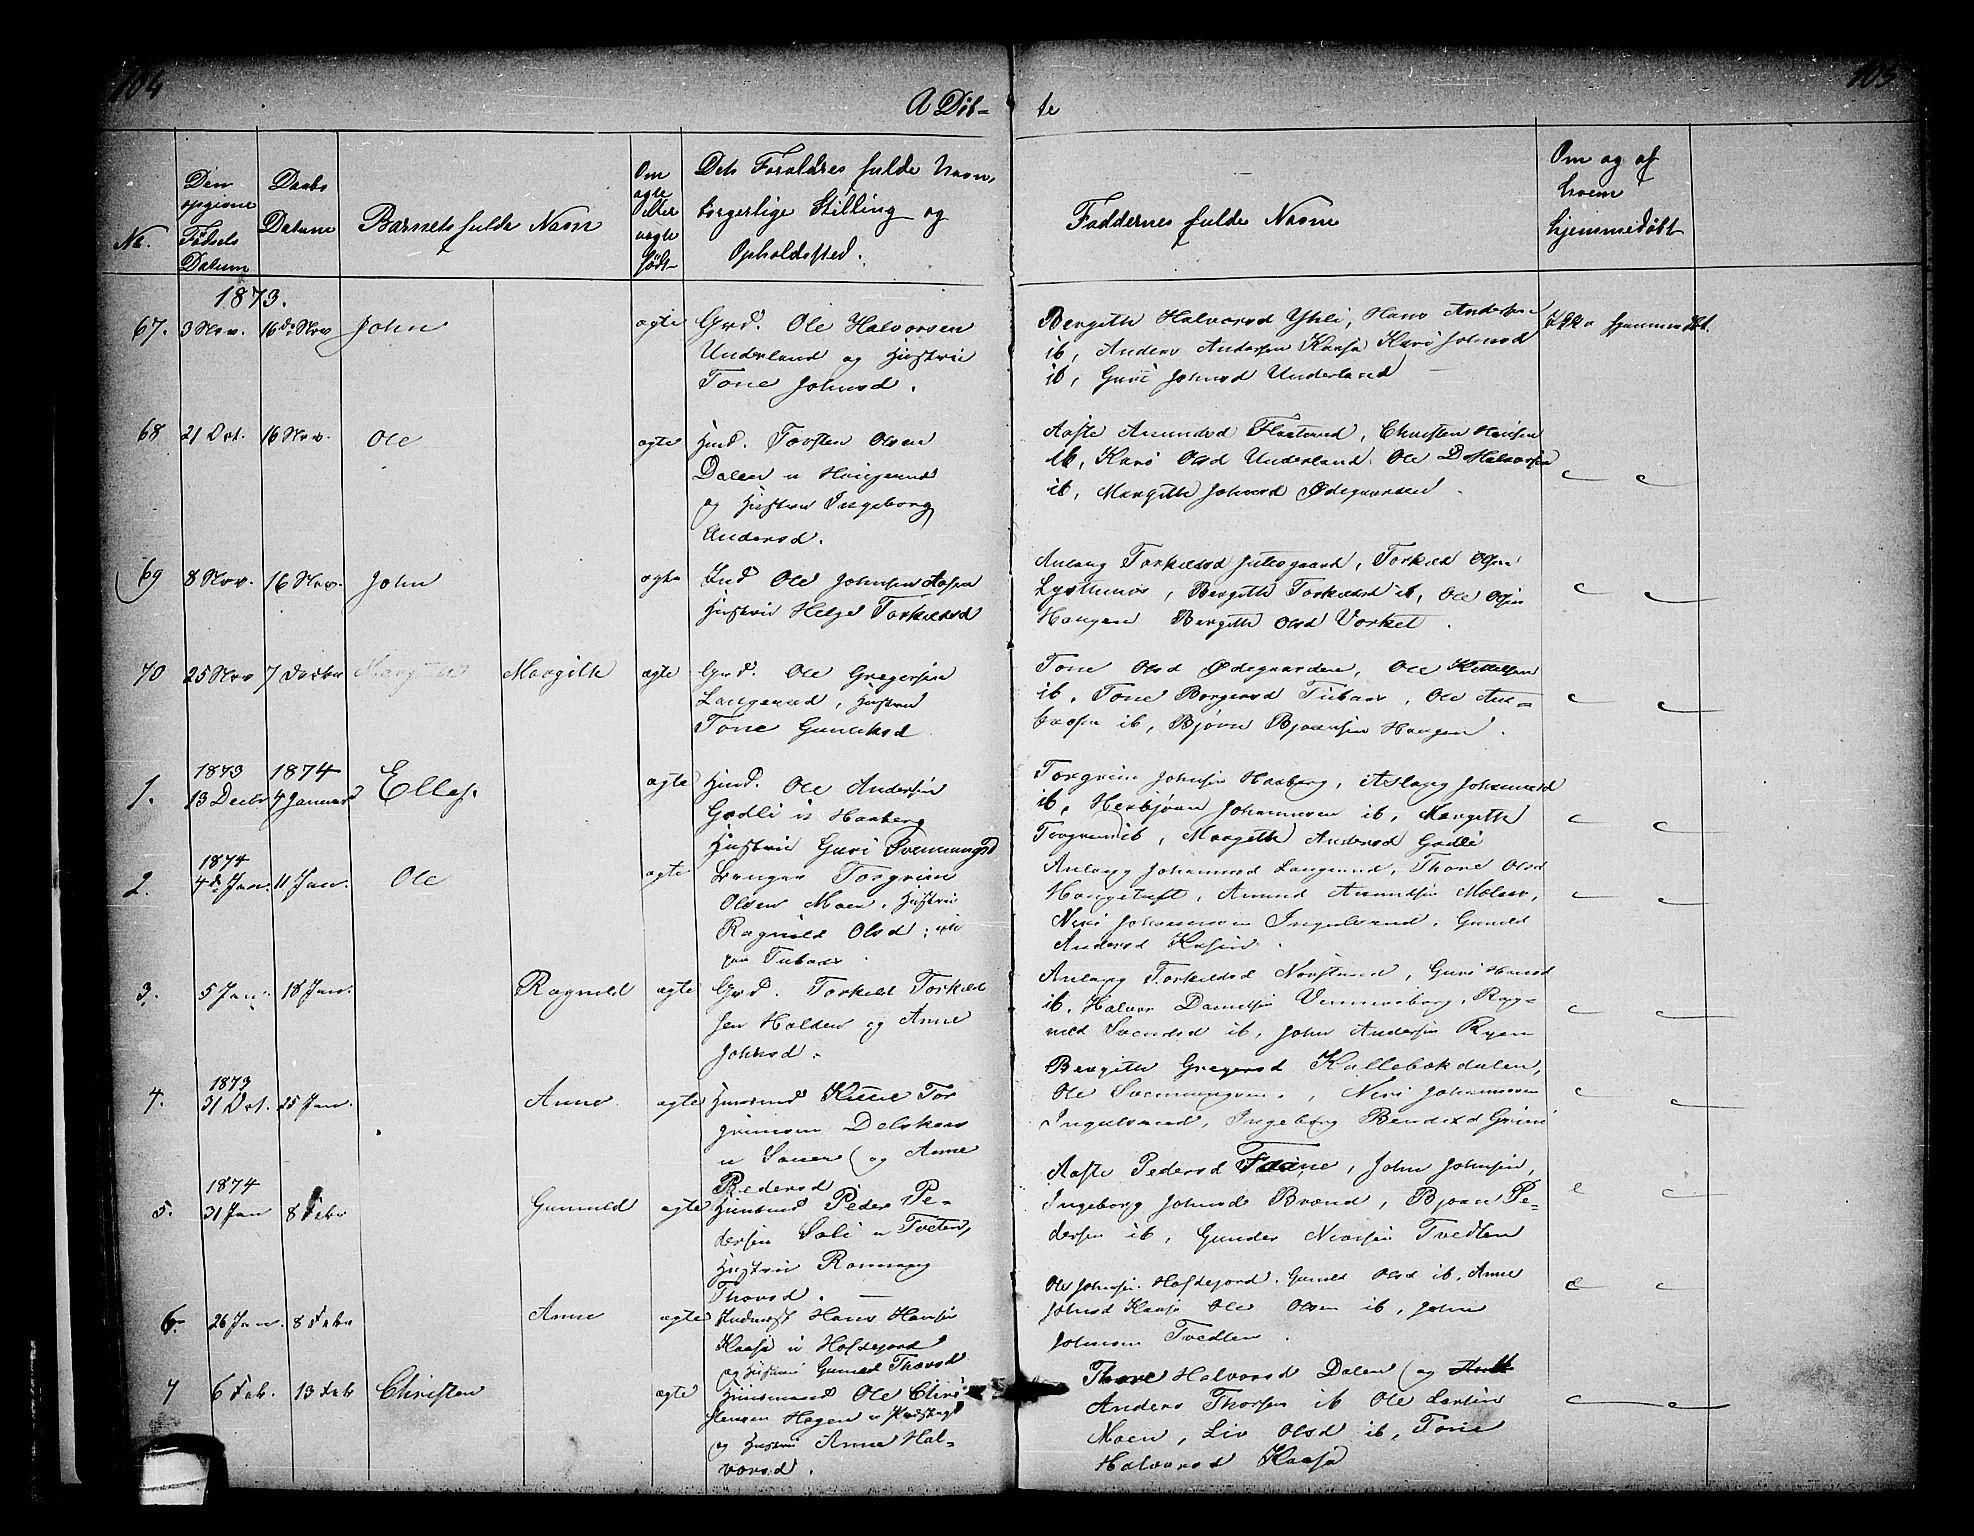 SAKO, Heddal kirkebøker, G/Ga/L0001: Klokkerbok nr. I 1, 1866-1878, s. 104-105